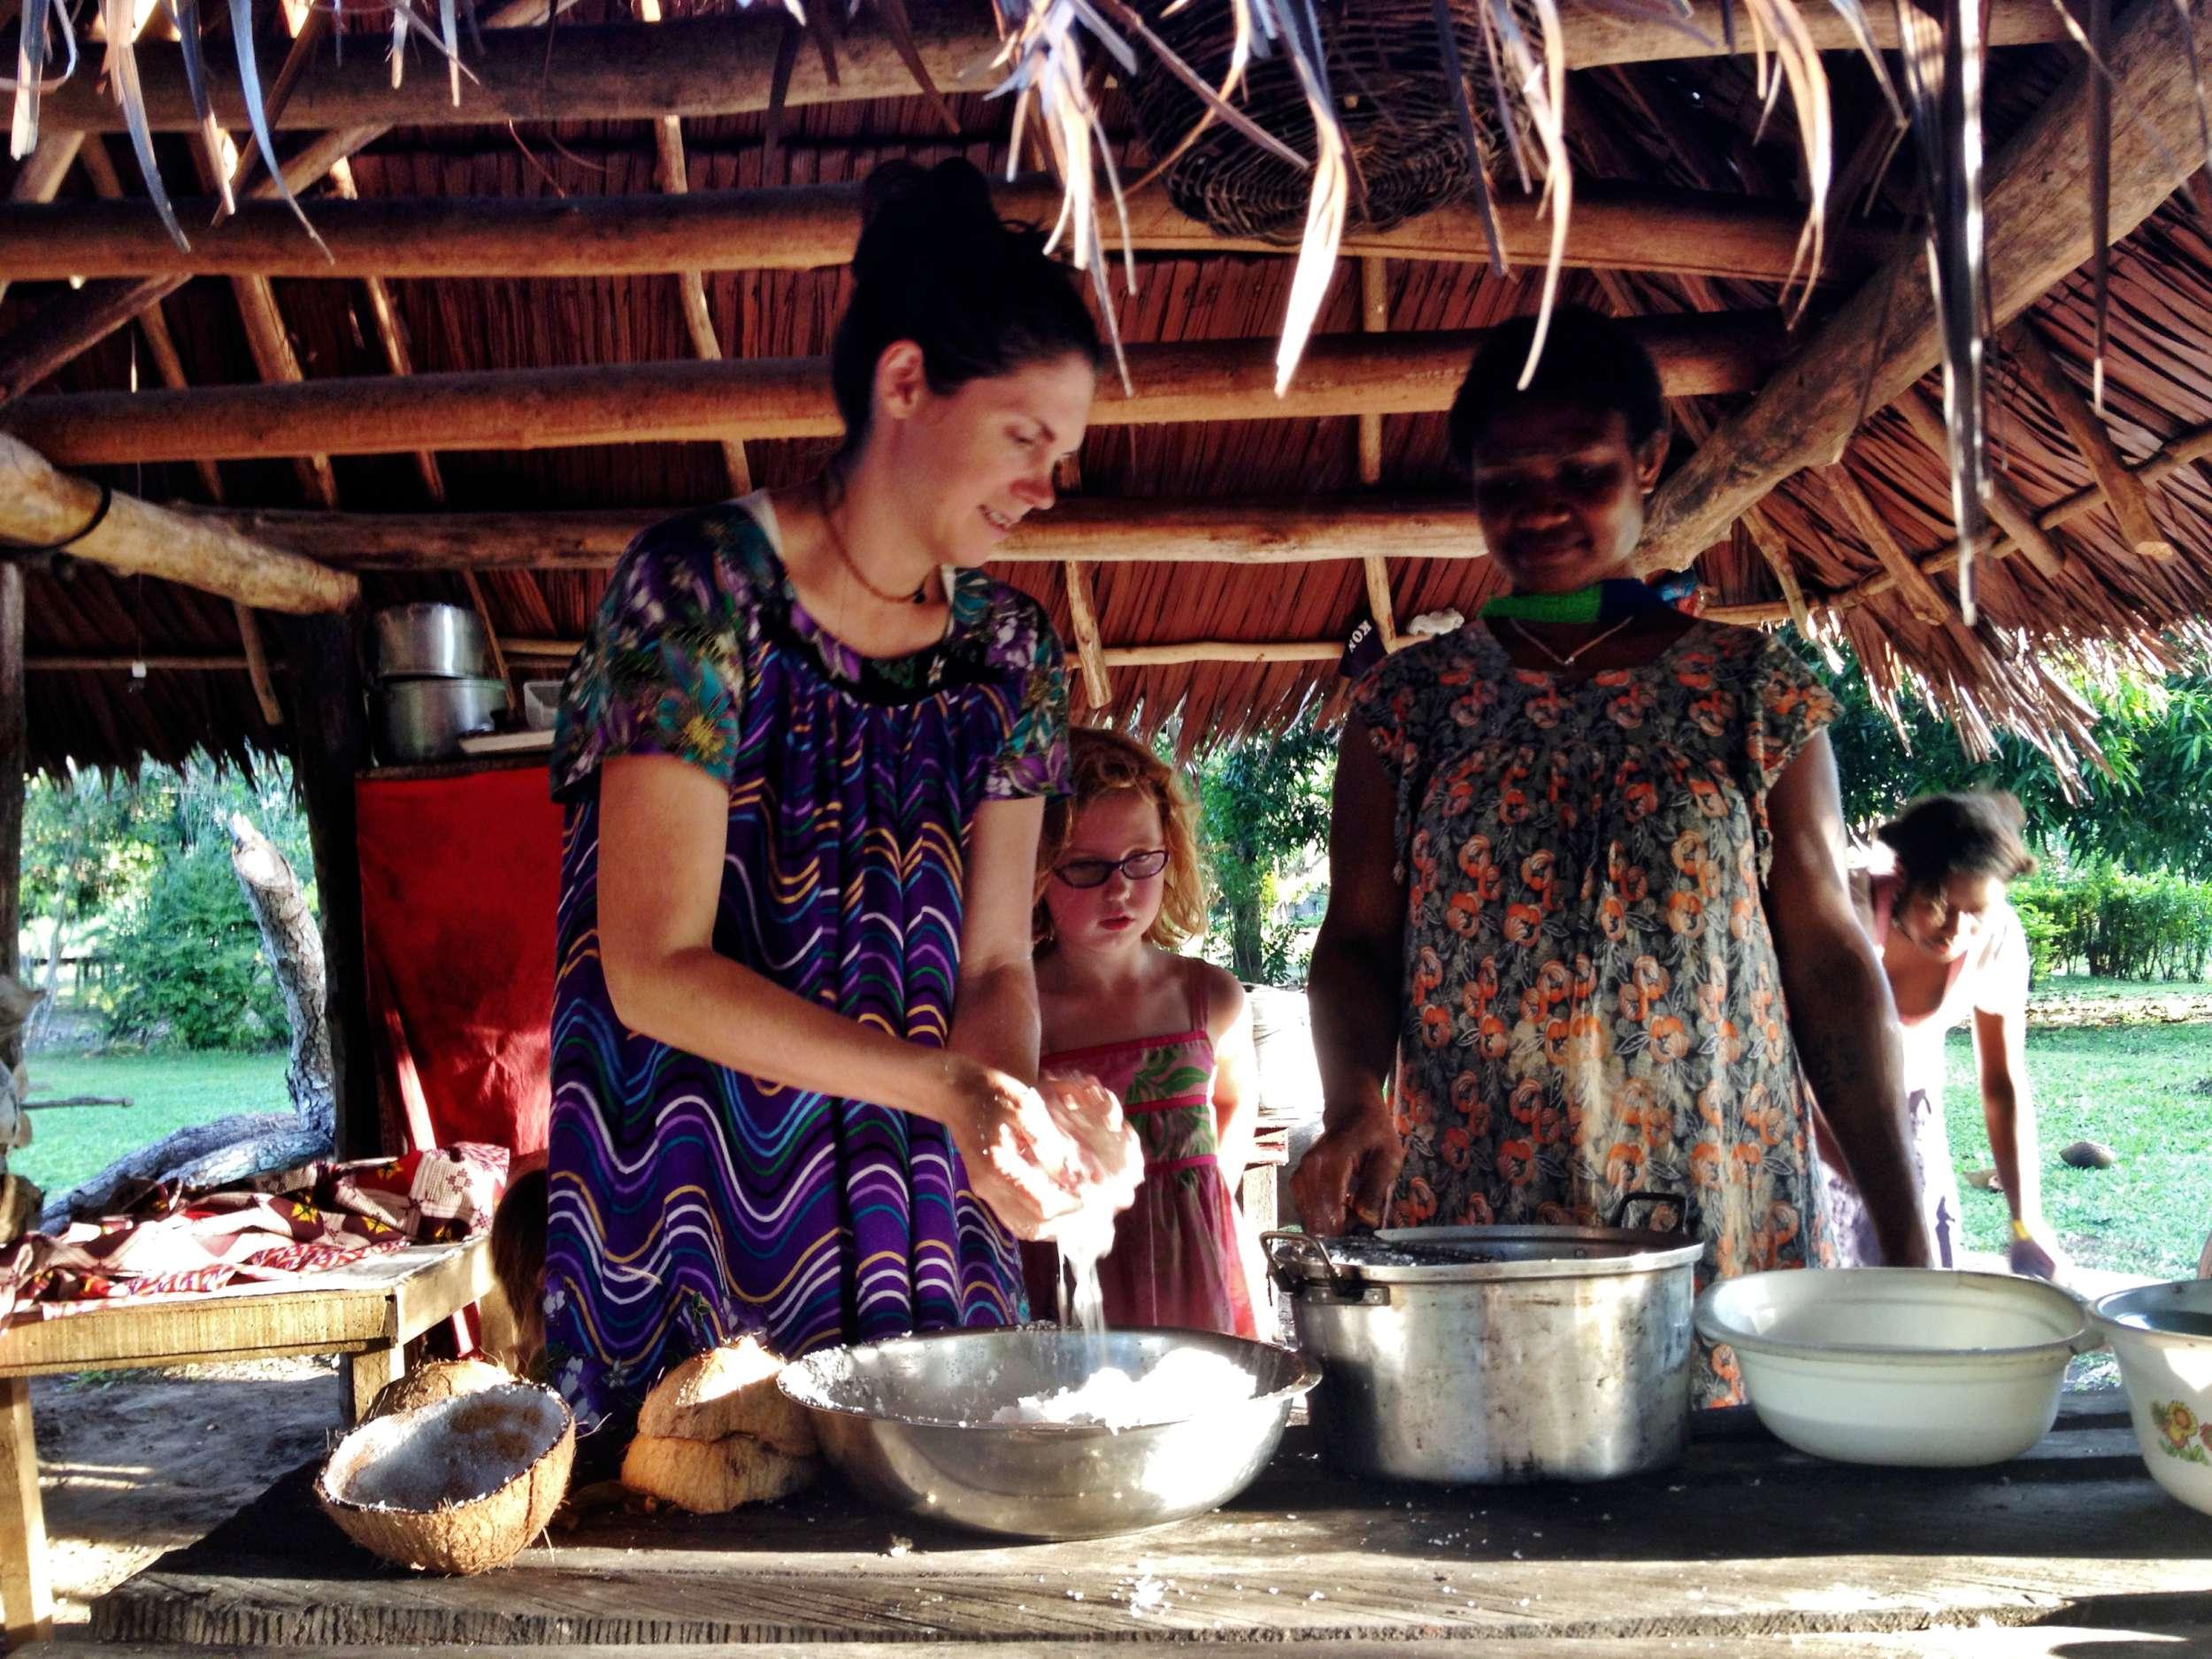 Kristi greasing coconuts.